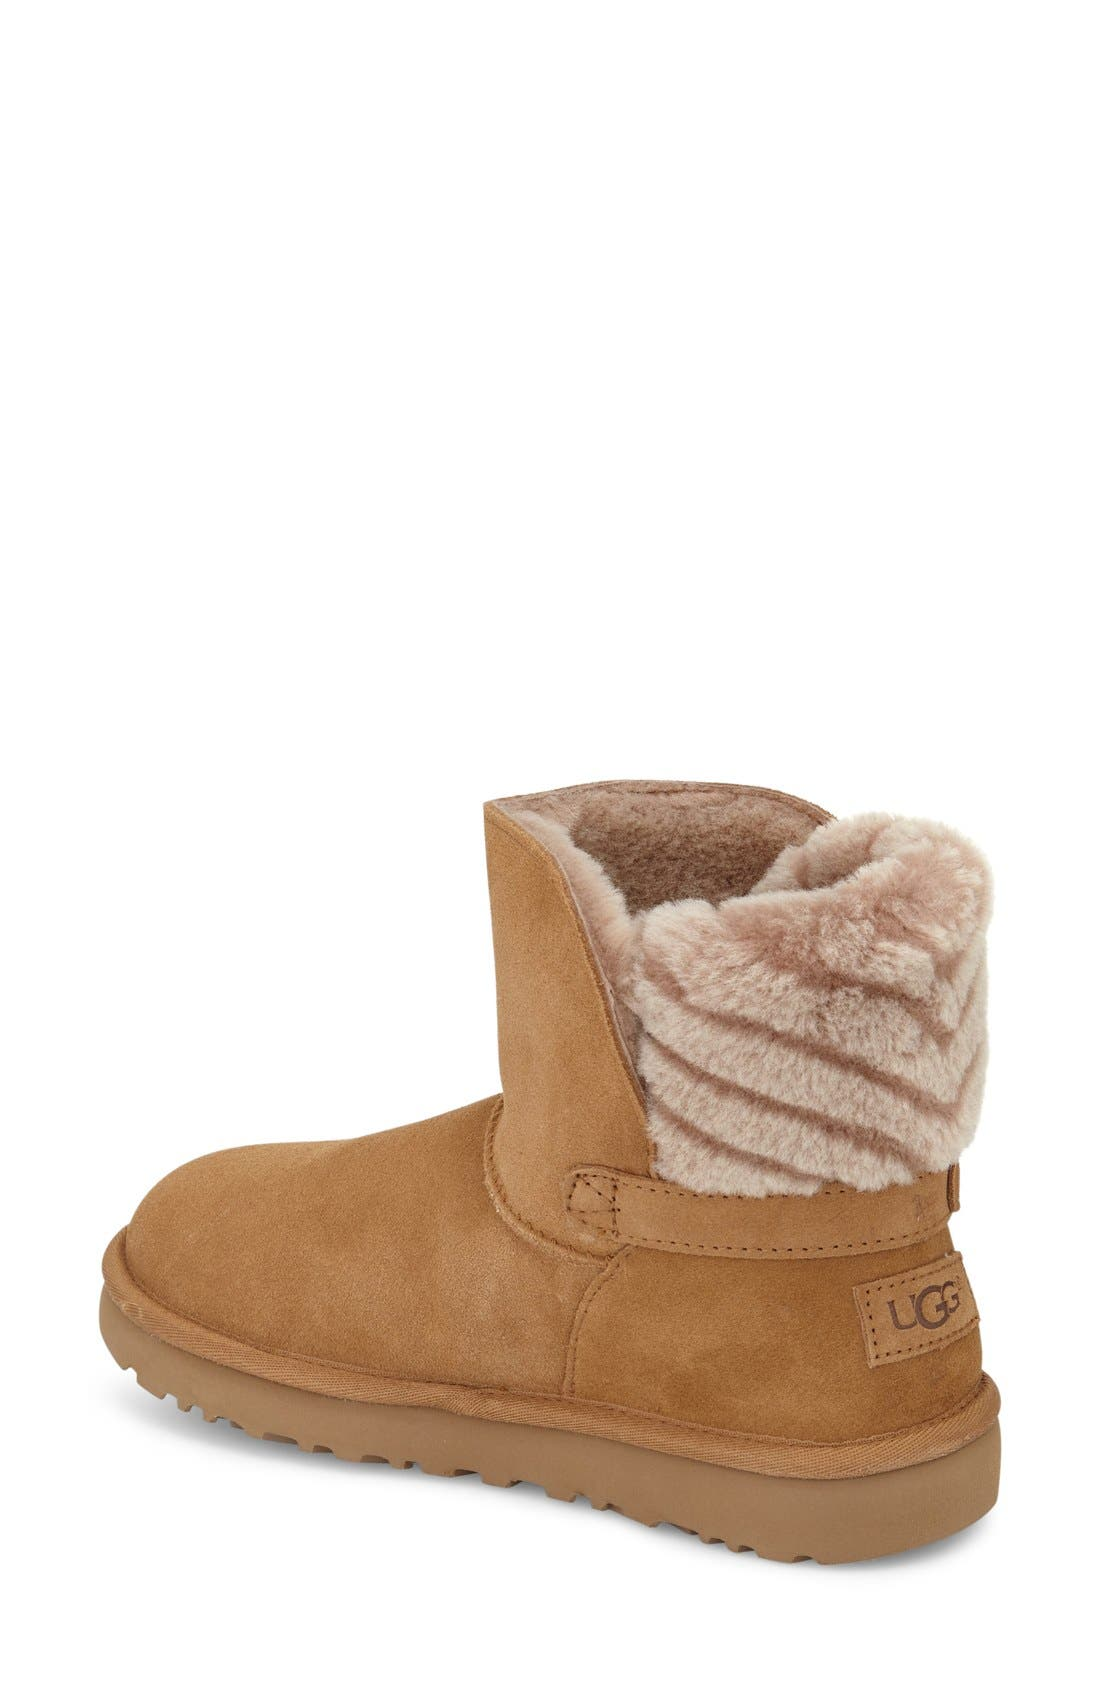 Alternate Image 2  - UGG 'Adria' Boot (Women)